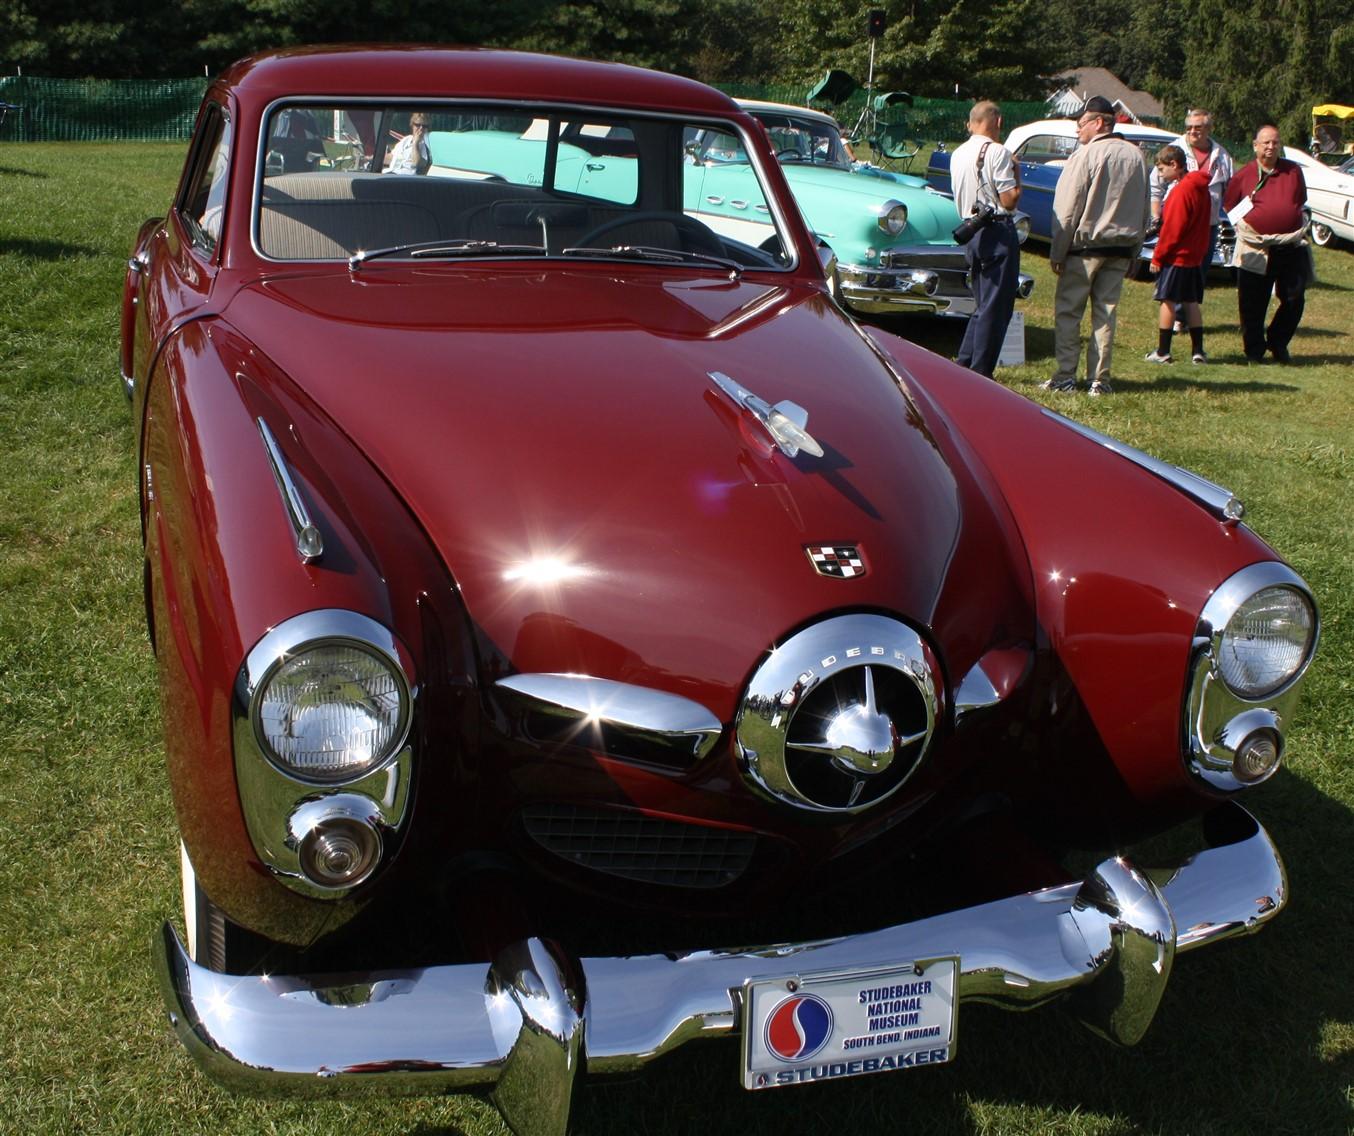 2011 09 18  Canton Glenmoor Concours 108.jpg